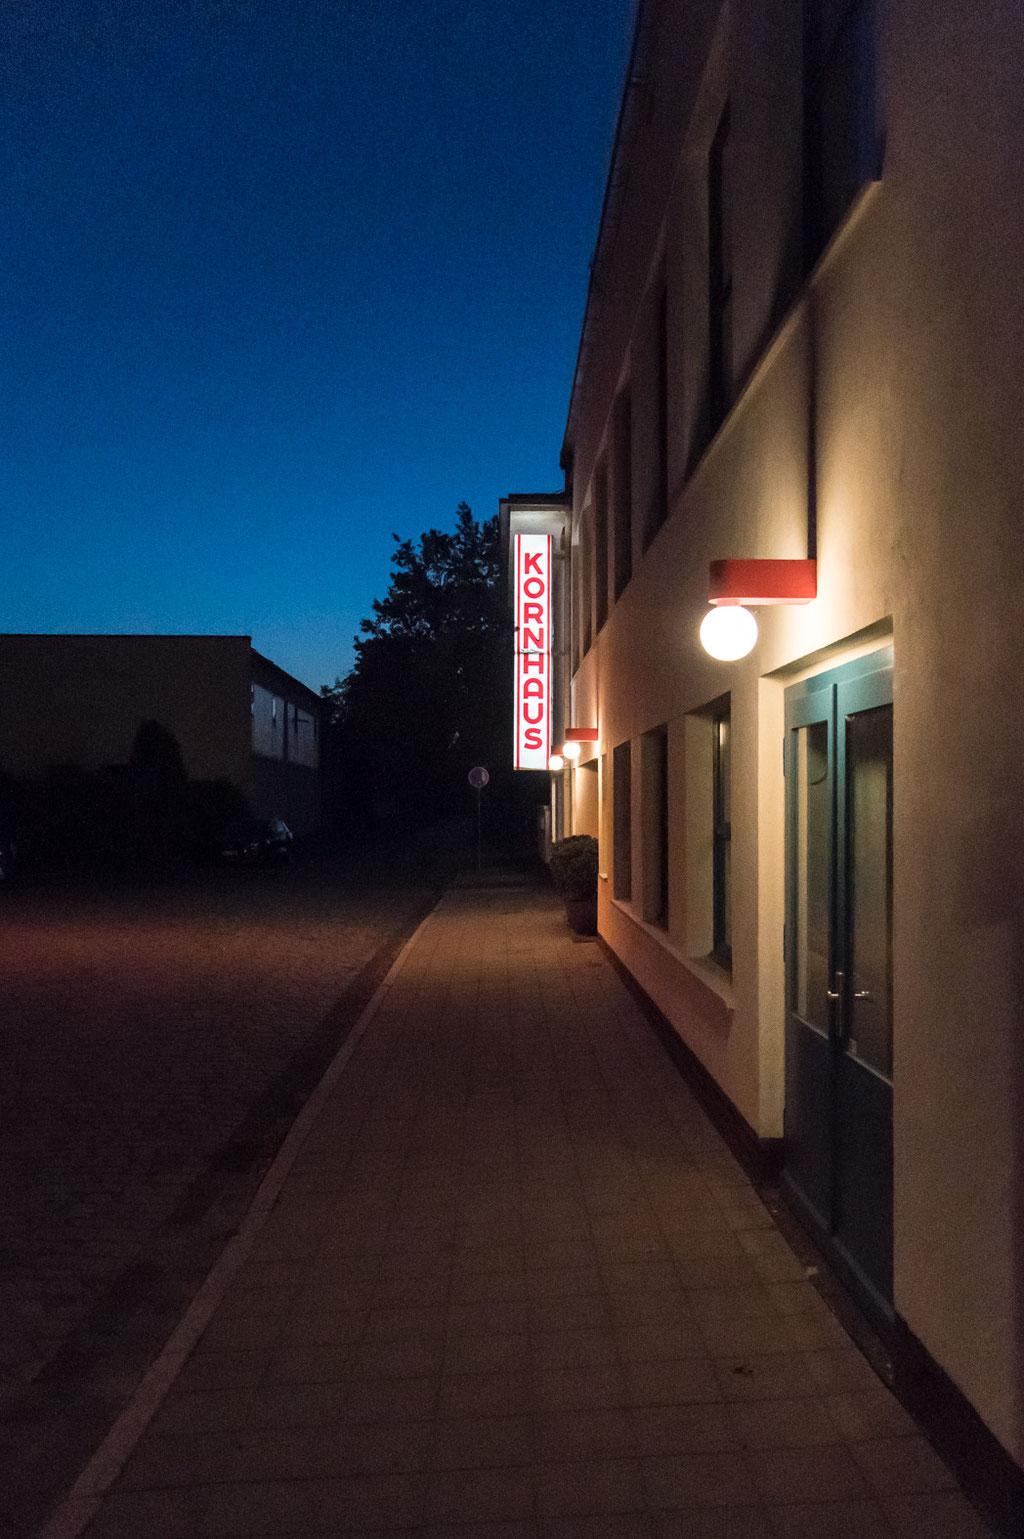 Ausflugsgaststätte Kornhaus (Carl Fieger), Dessau (D)